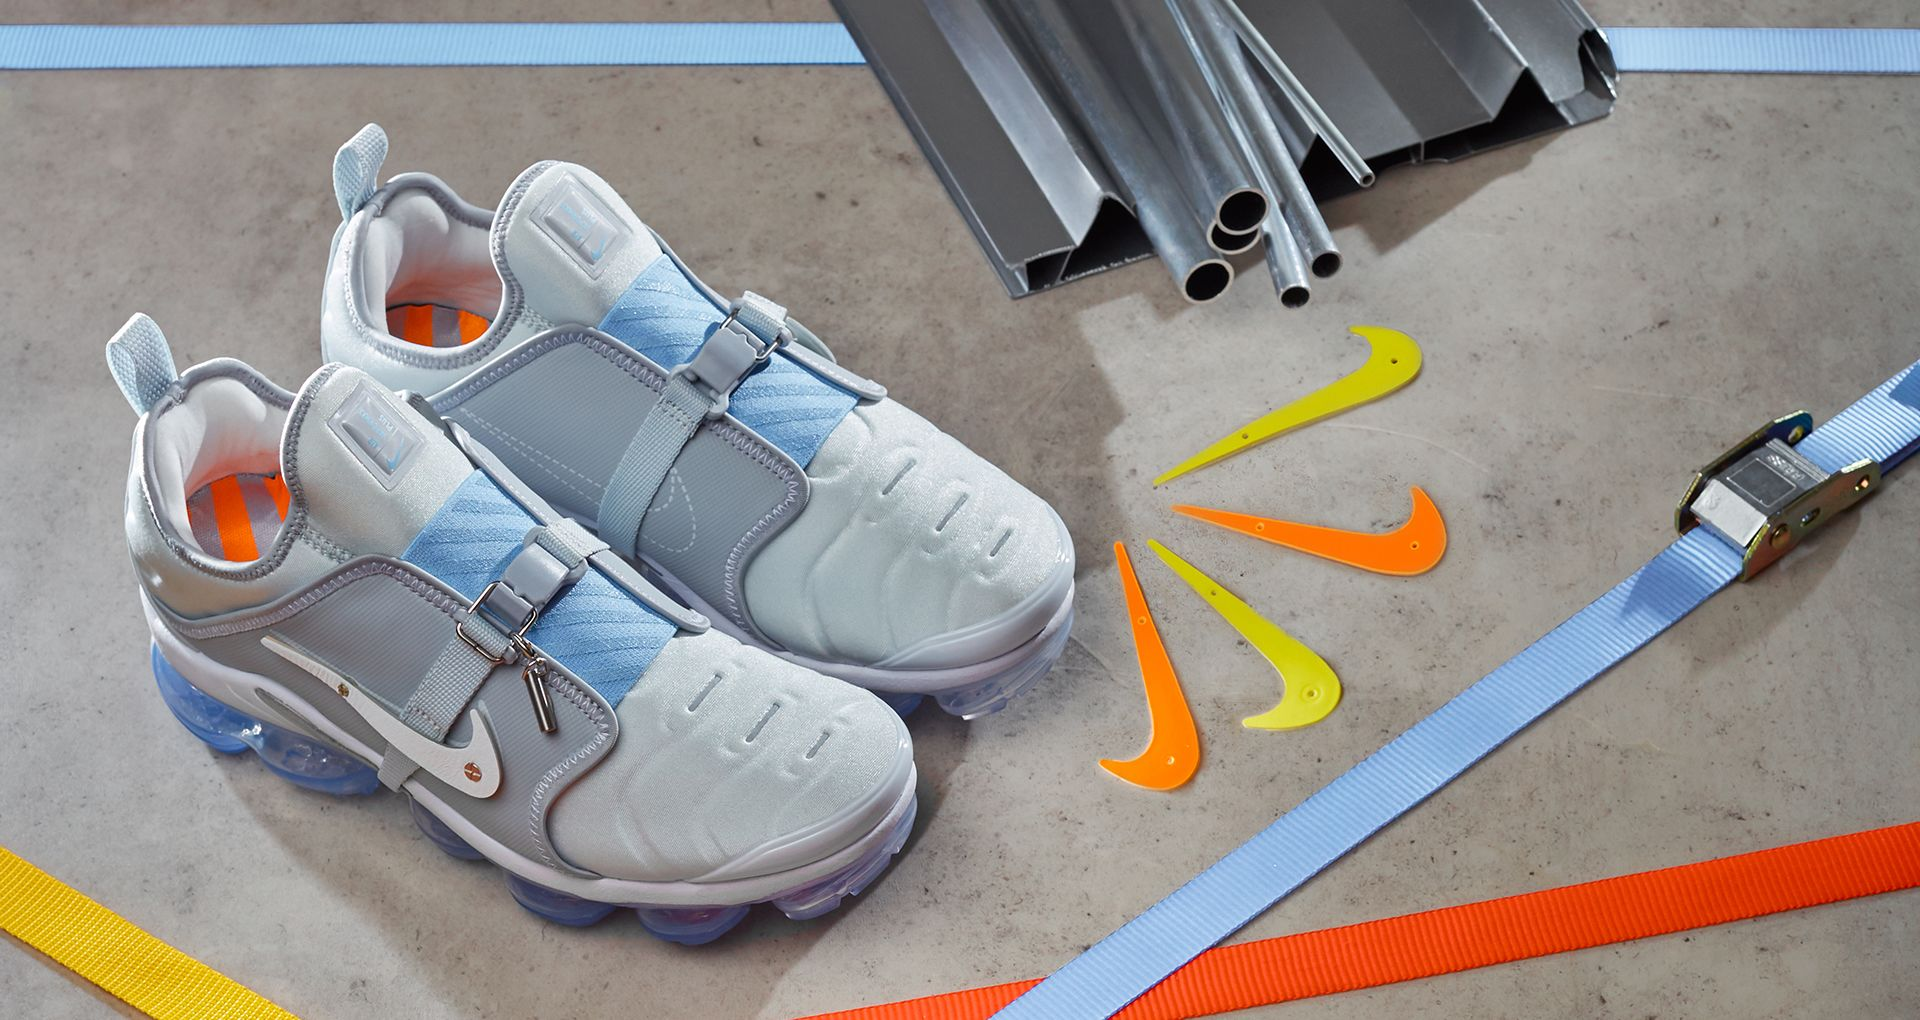 79cf9576926 Behind the Design  Nike Air VaporMax Plus  Paris Works in Progress ...